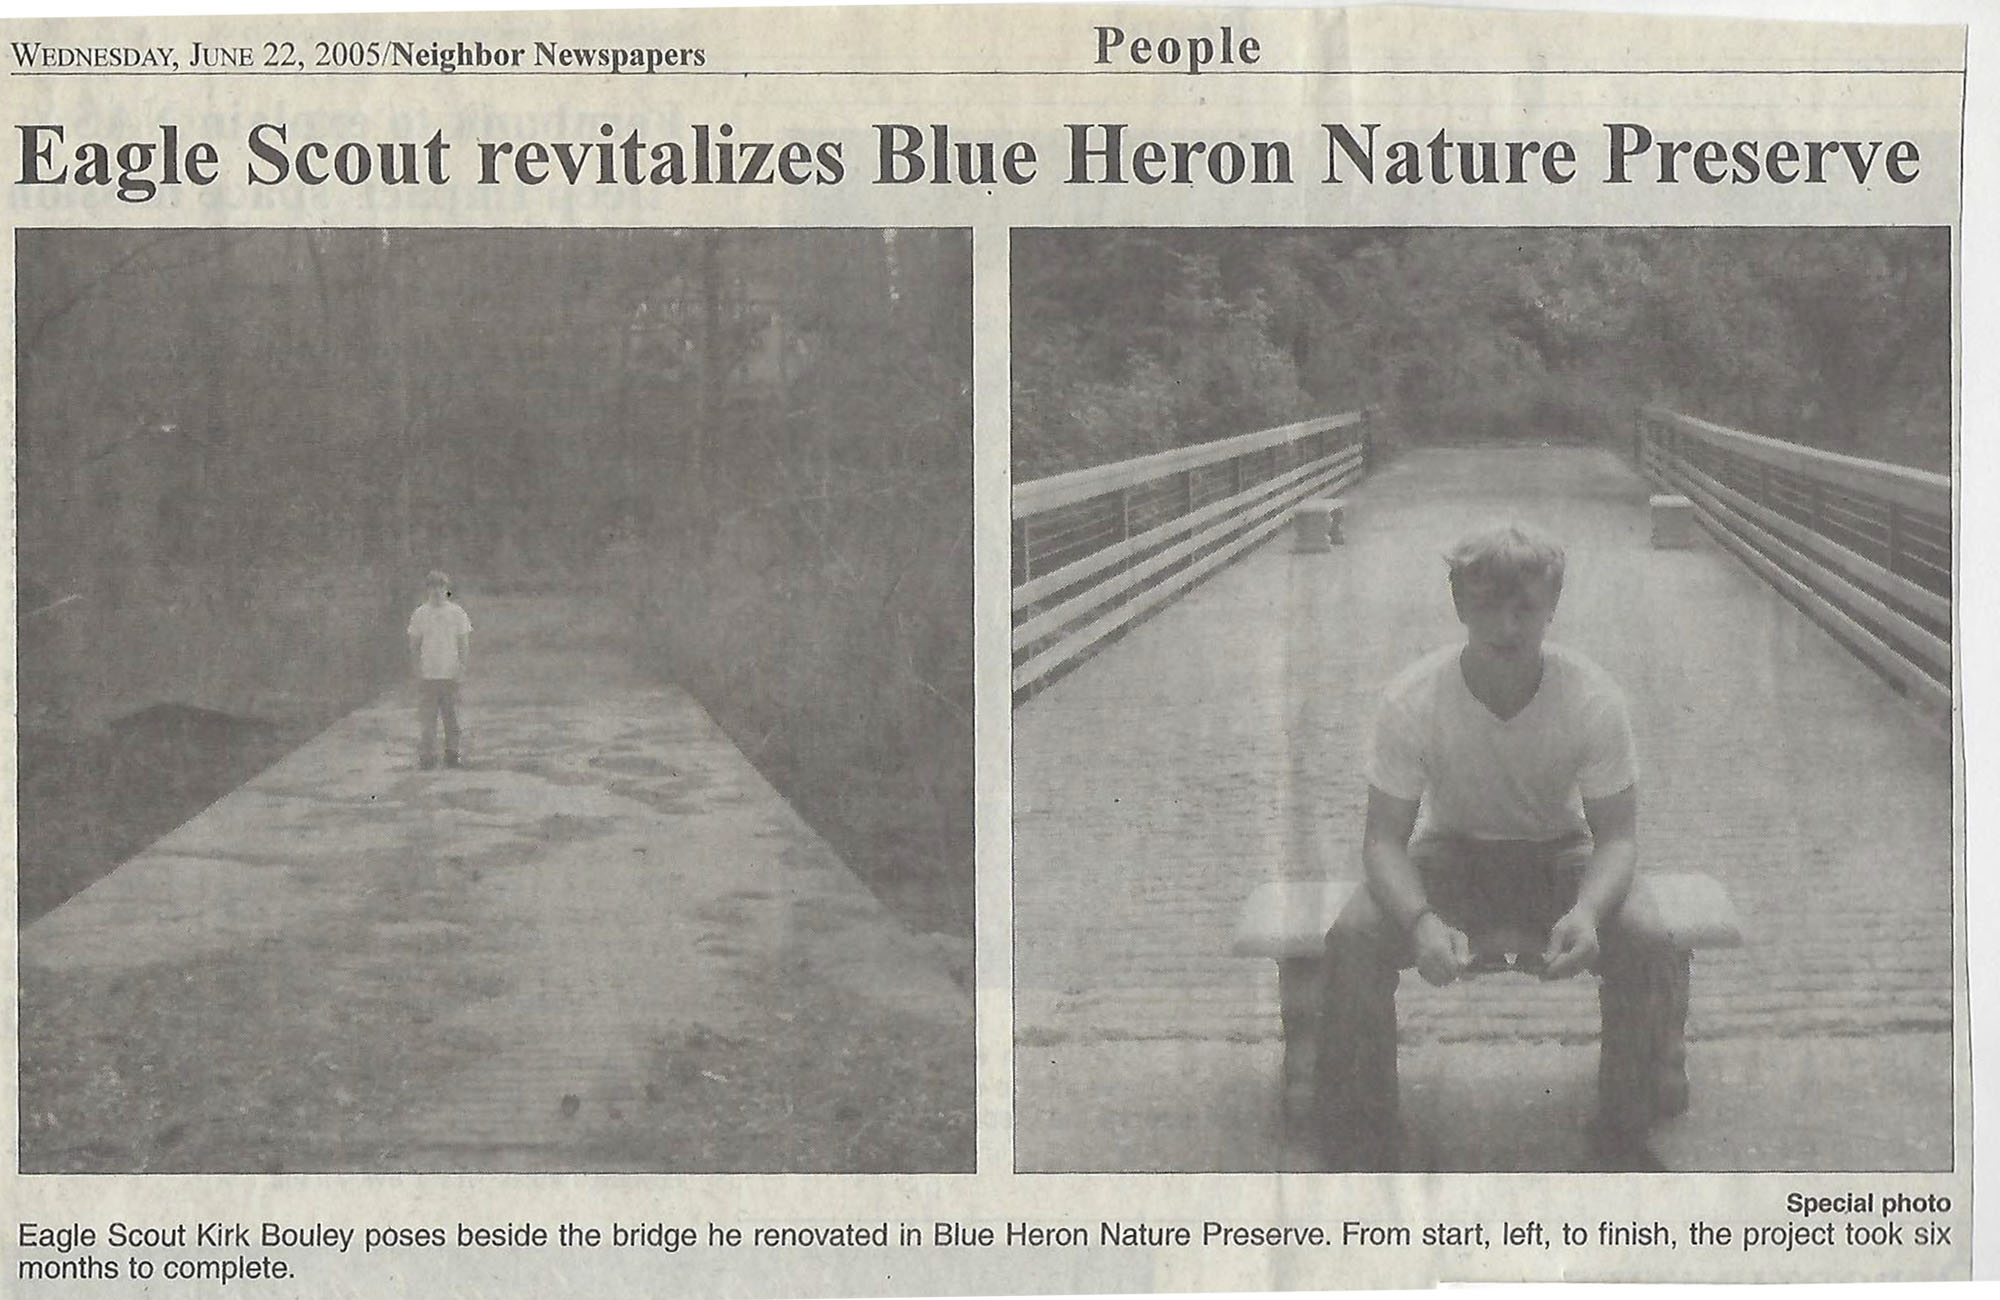 Kirk Bouley's before/after bridge improvements at Emma Wetlands.